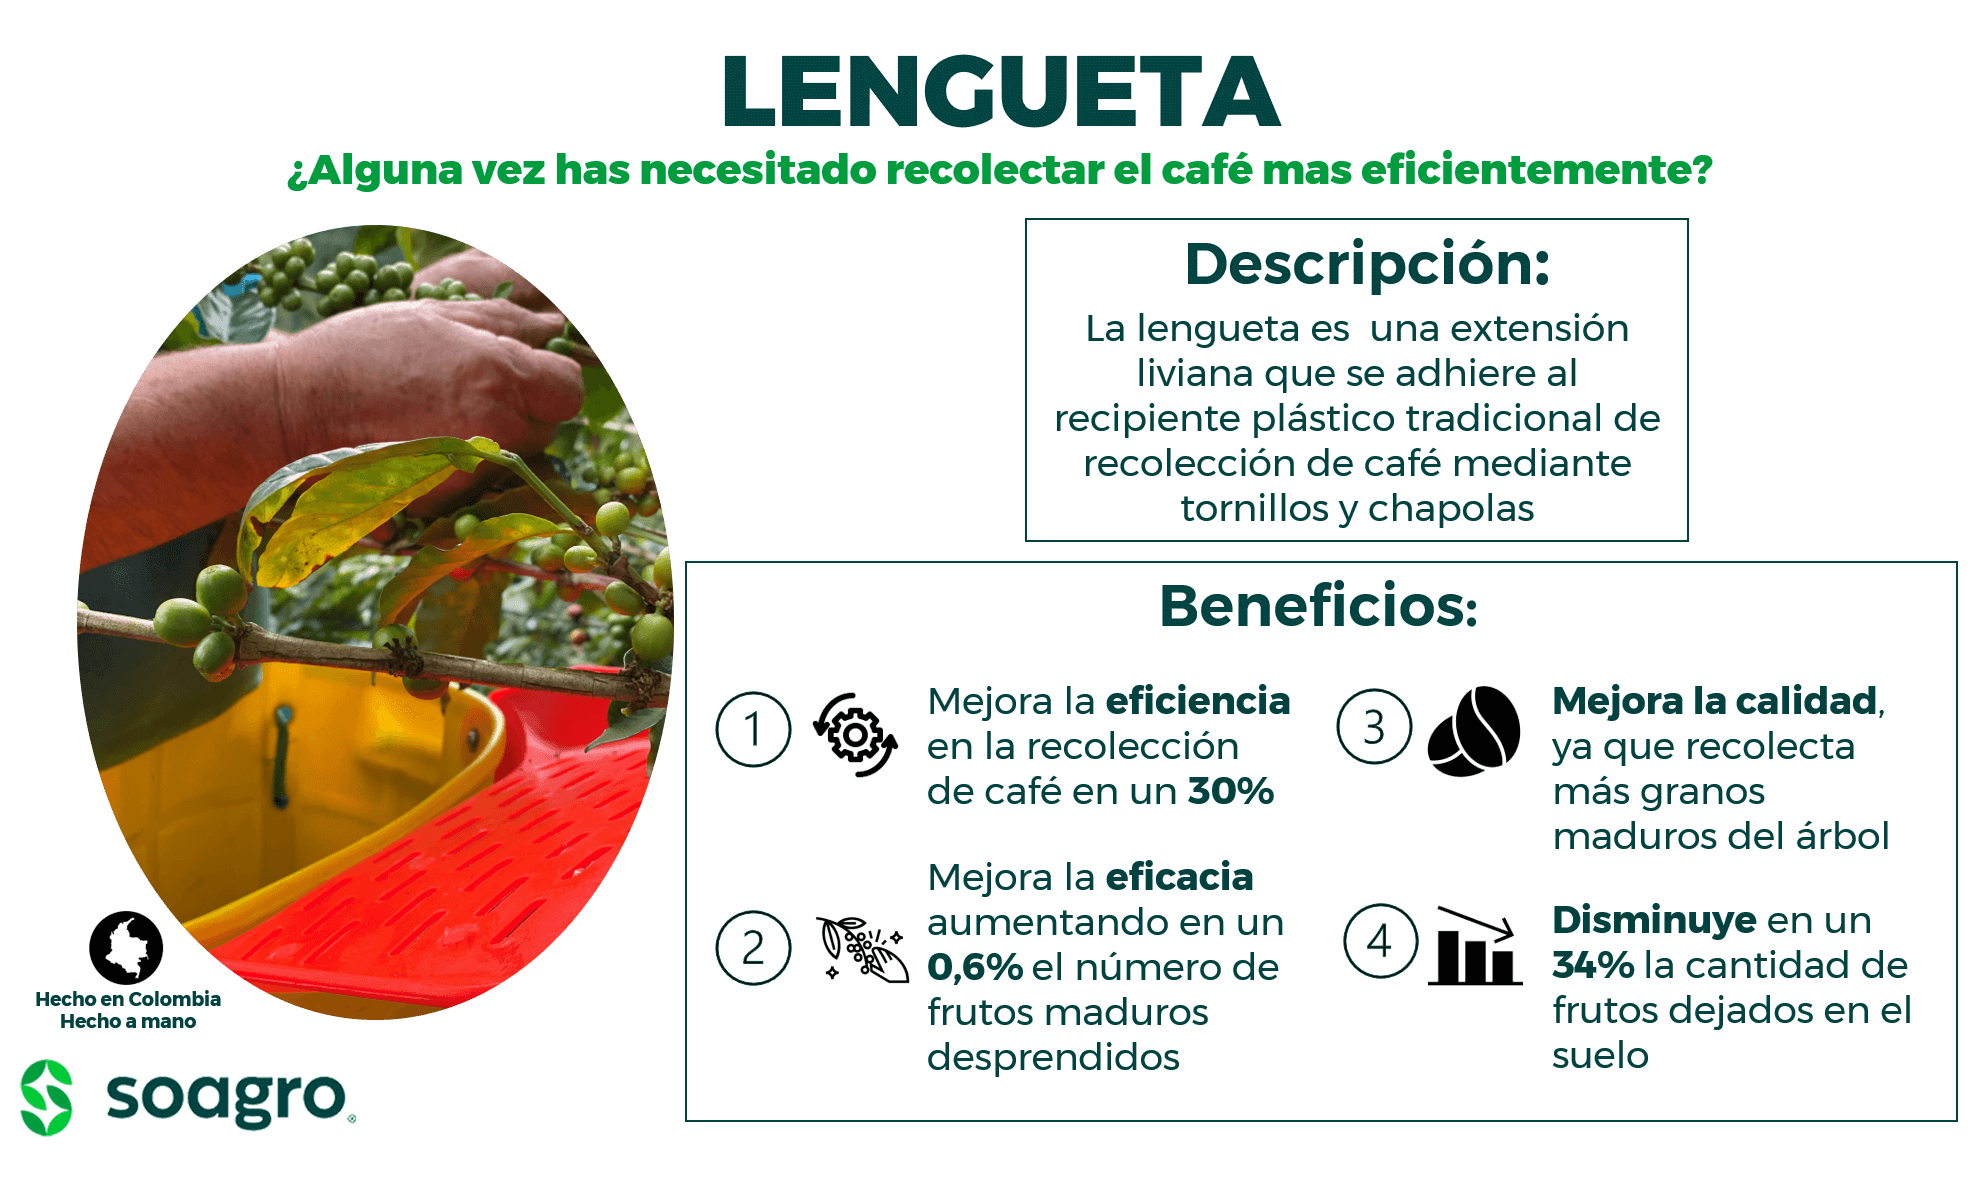 Lengueta_1.png